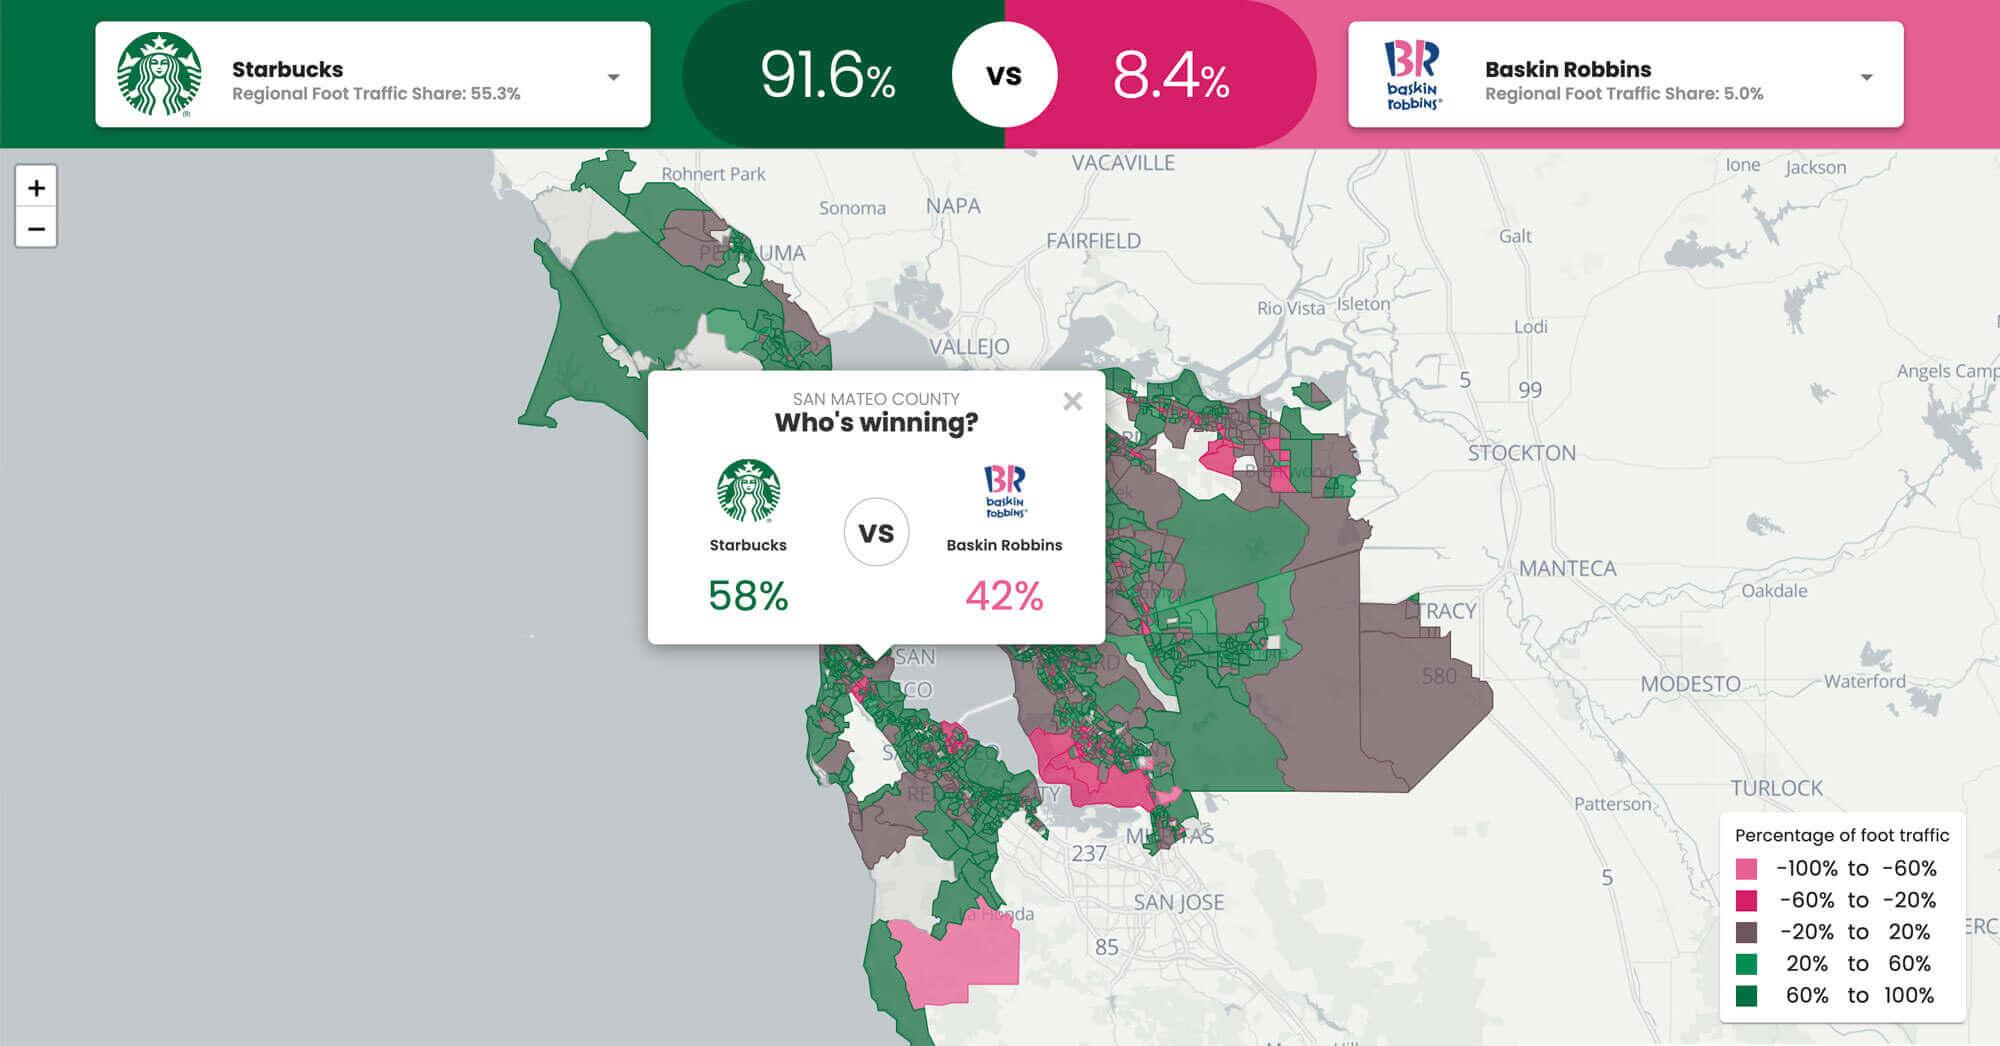 Brand Foot Traffic Comparisons Across the U.S.